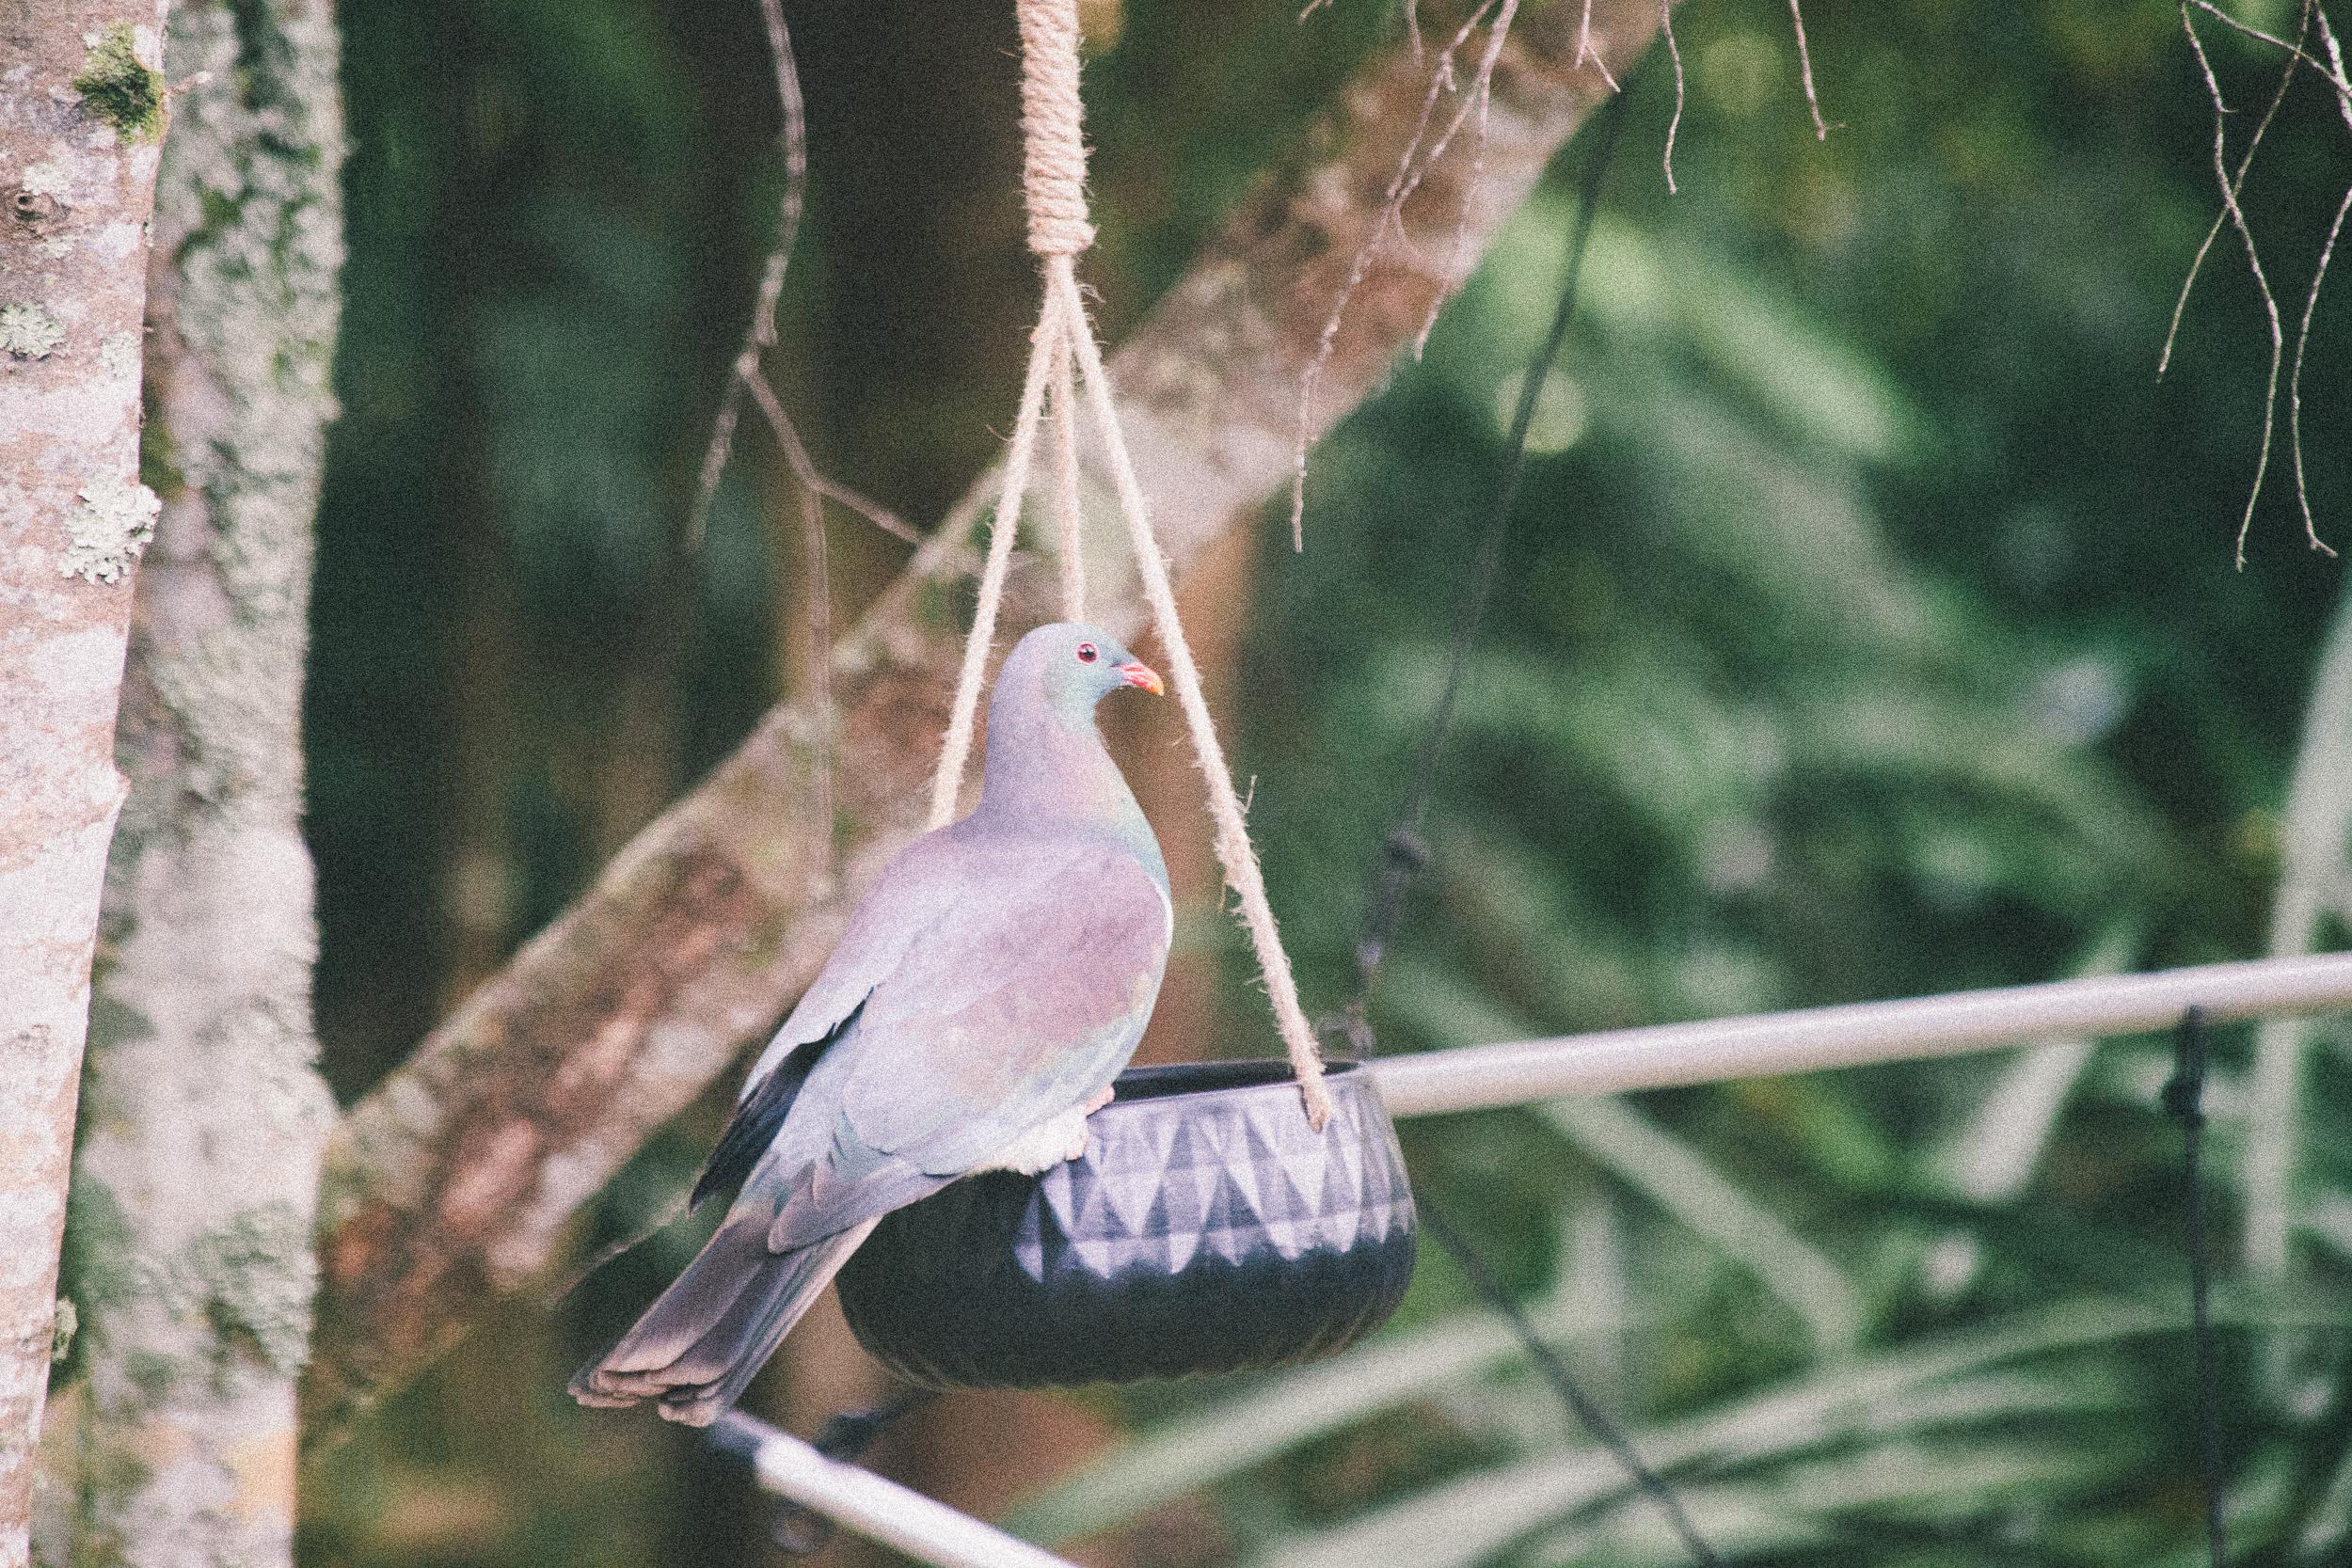 Kereru (NZ wood pigeon). (c) Leonie Wise